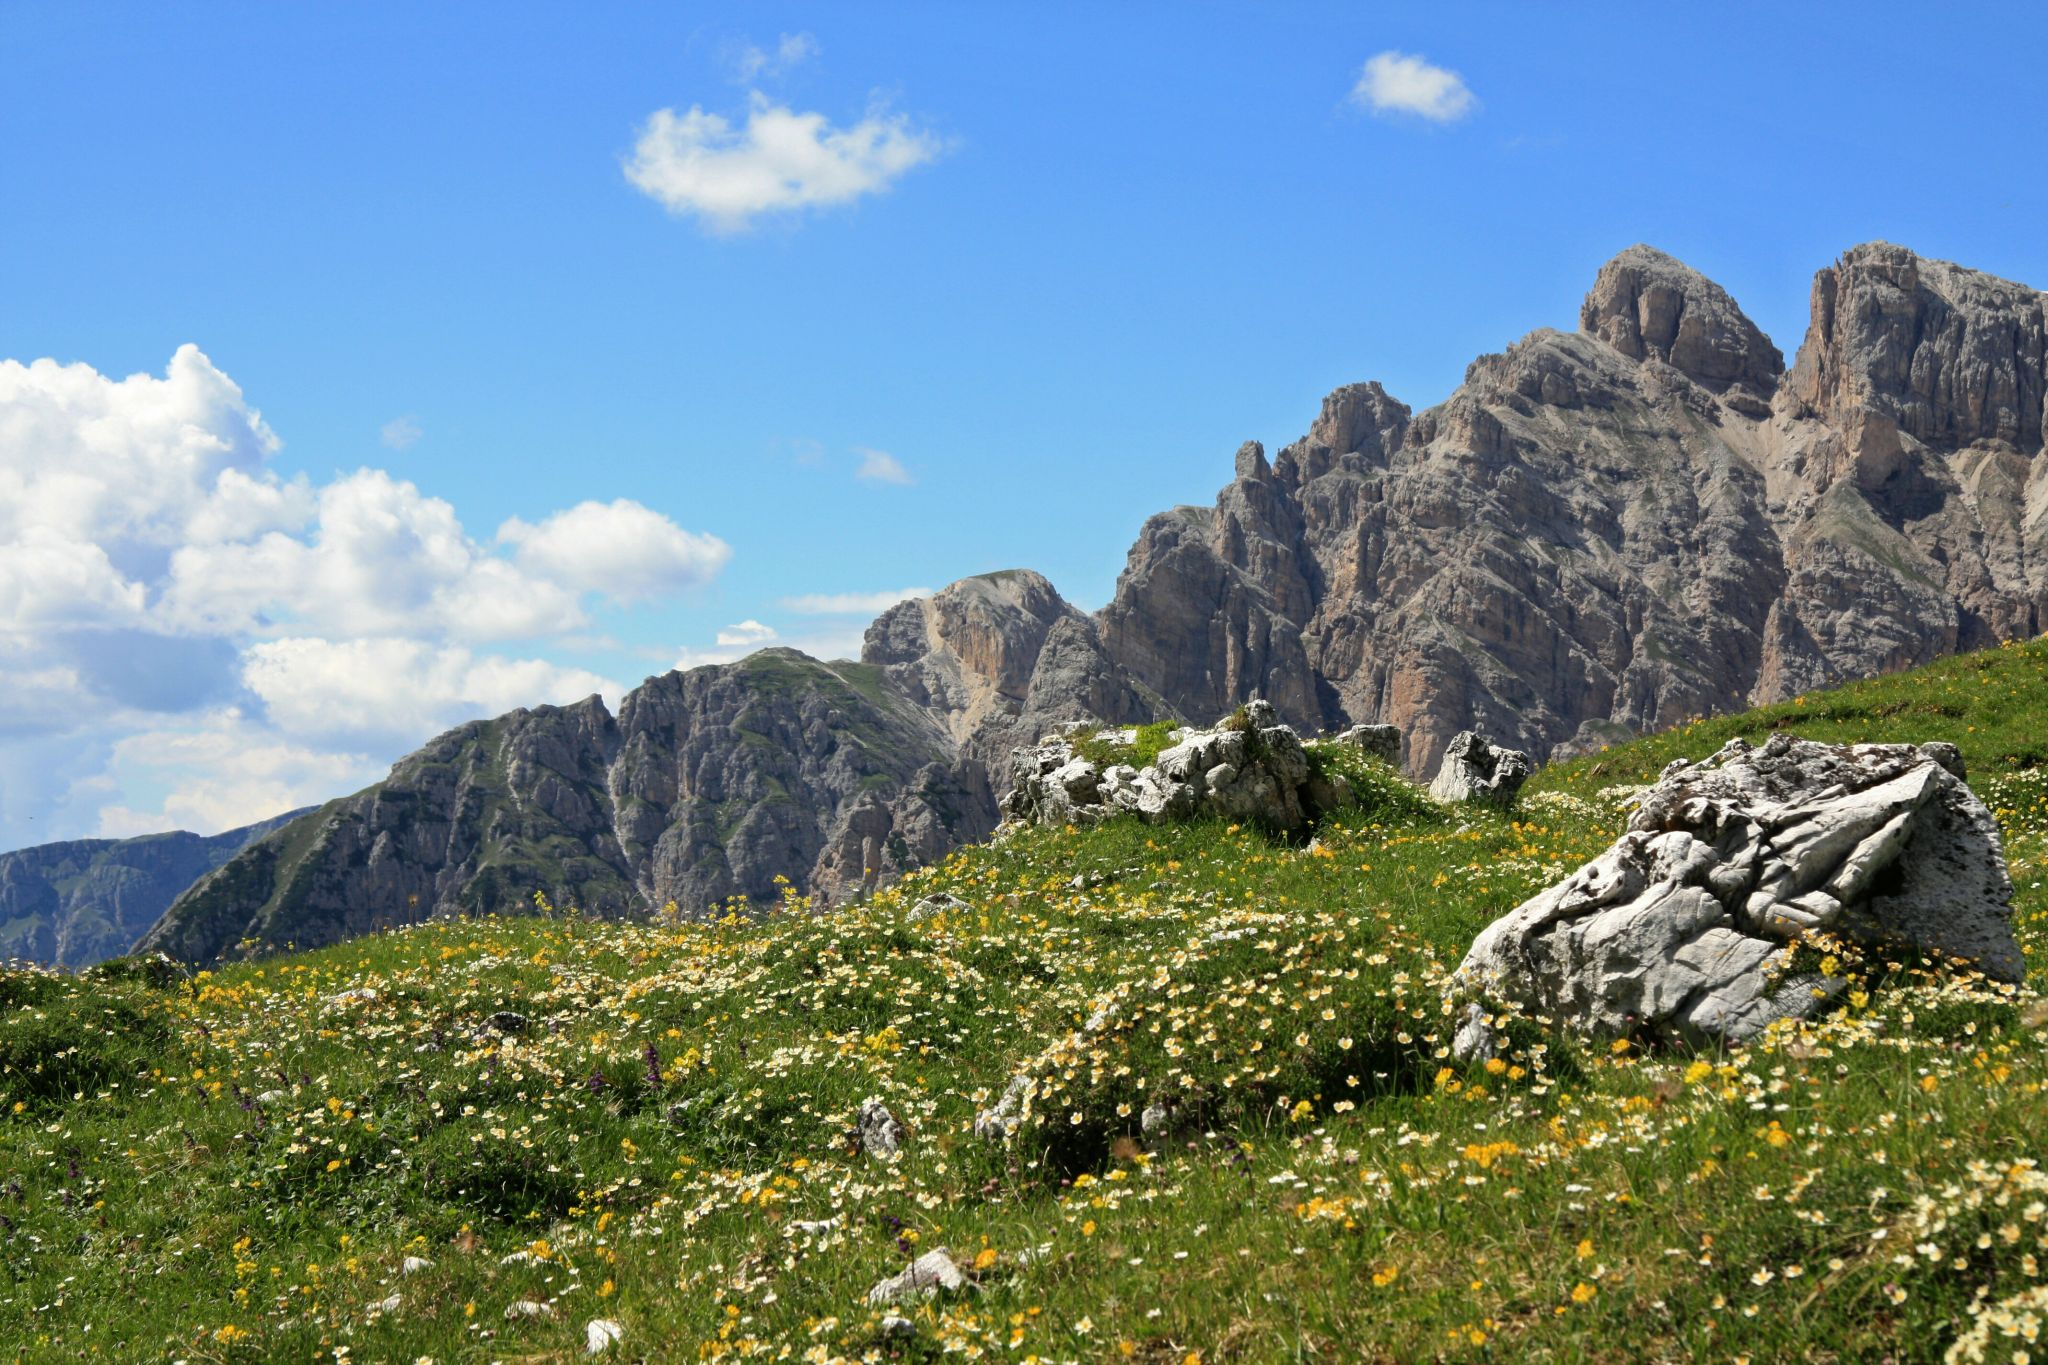 unterhalb der Drei Zinnen, Italy